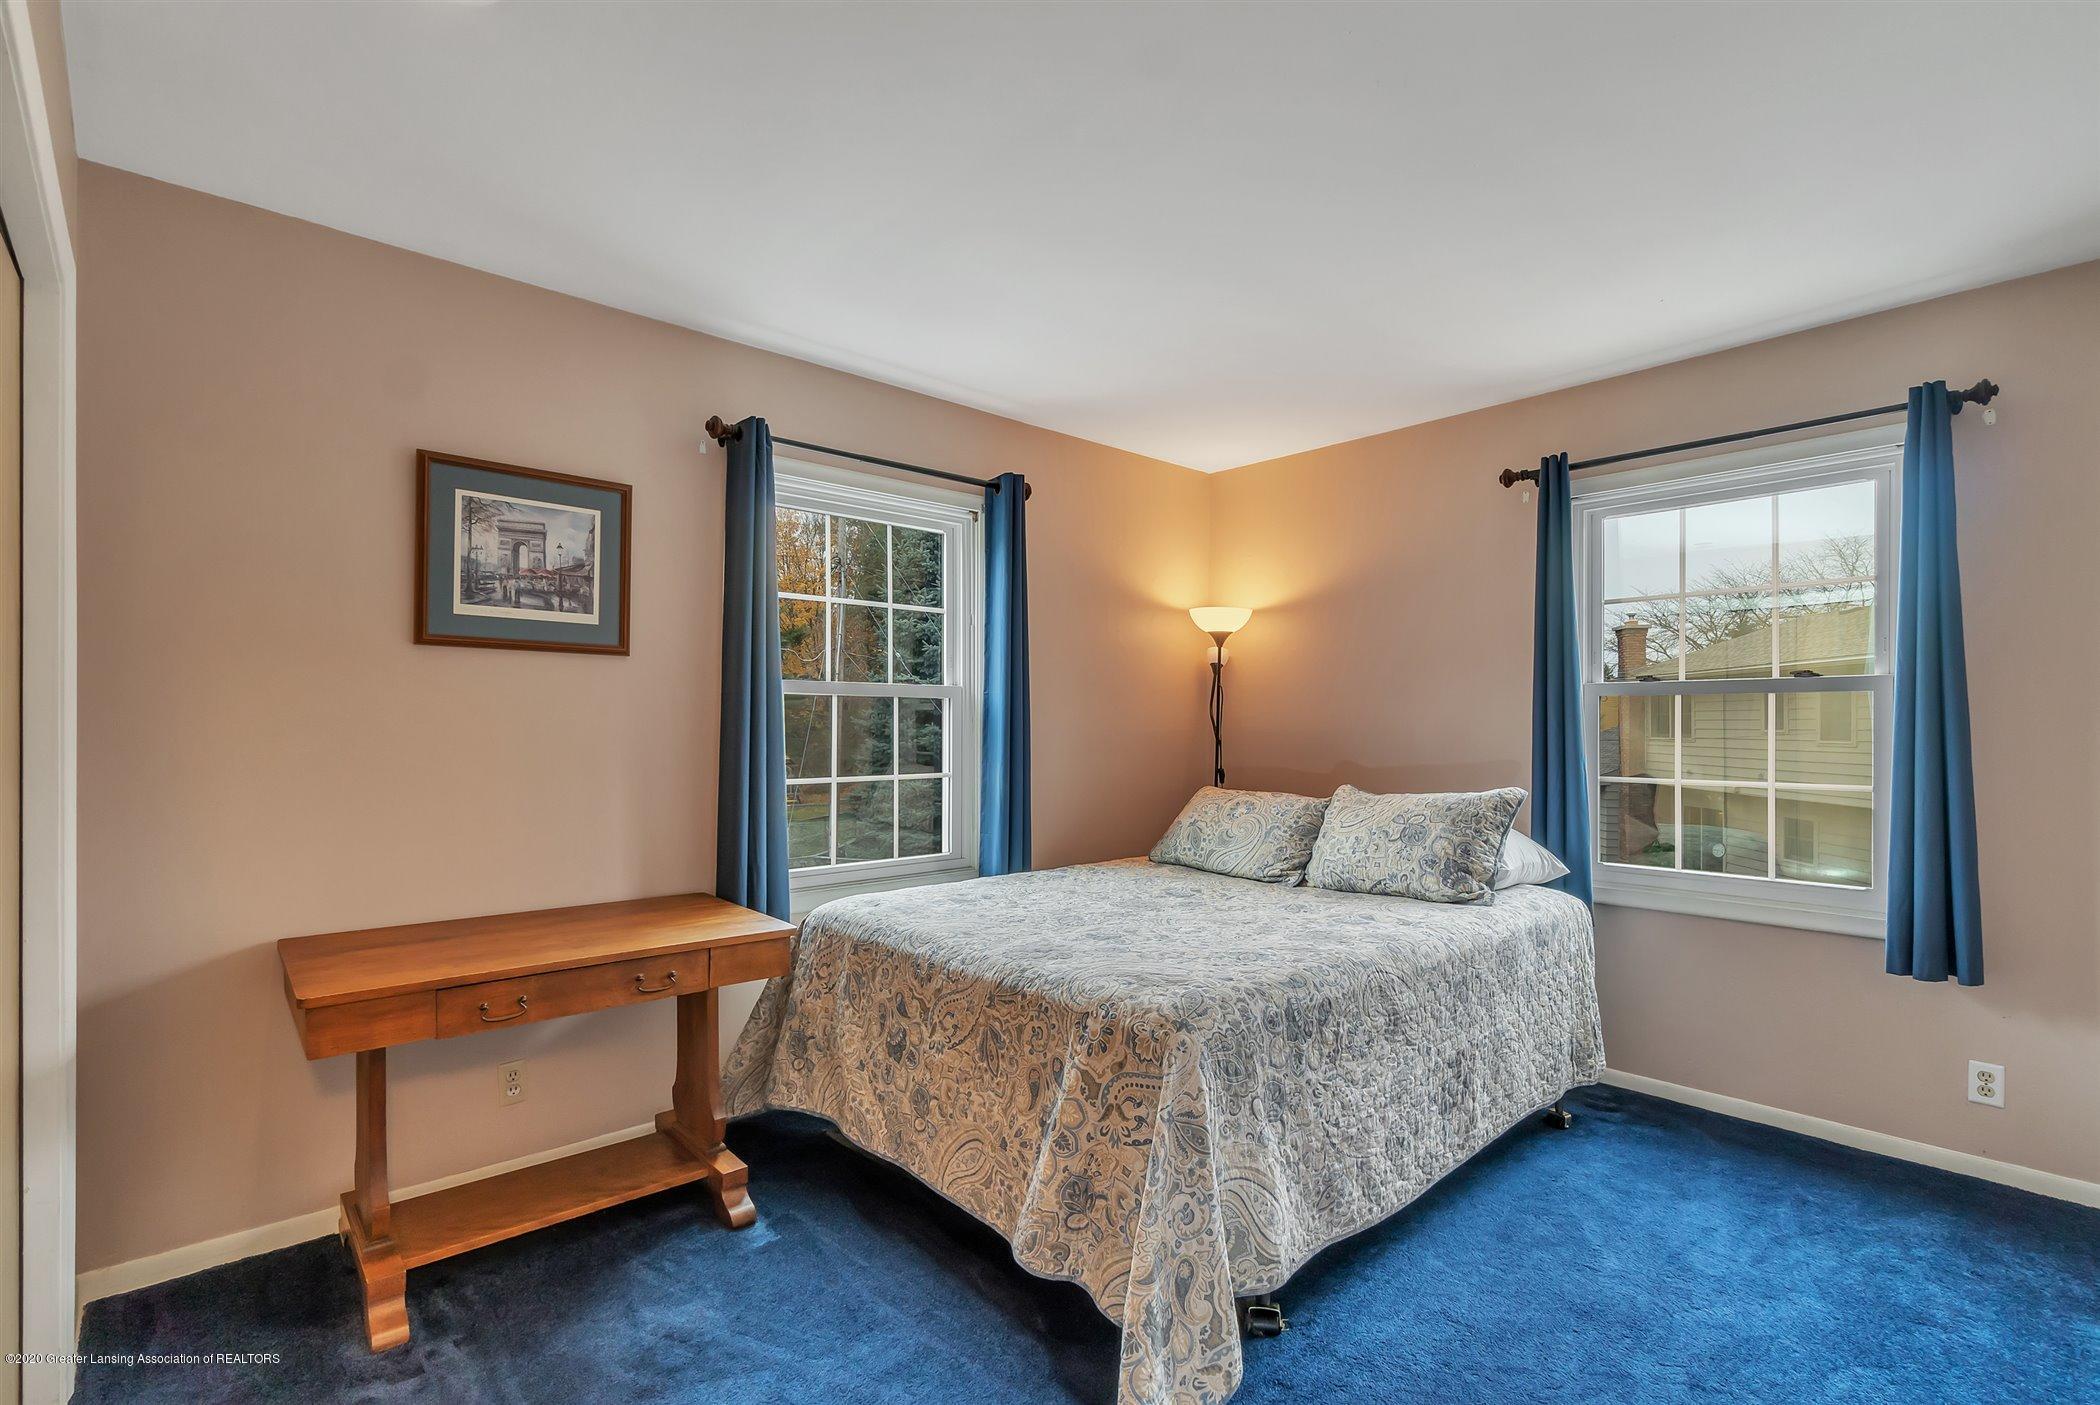 2098 Butternut Dr - Bedroom 4 - 30